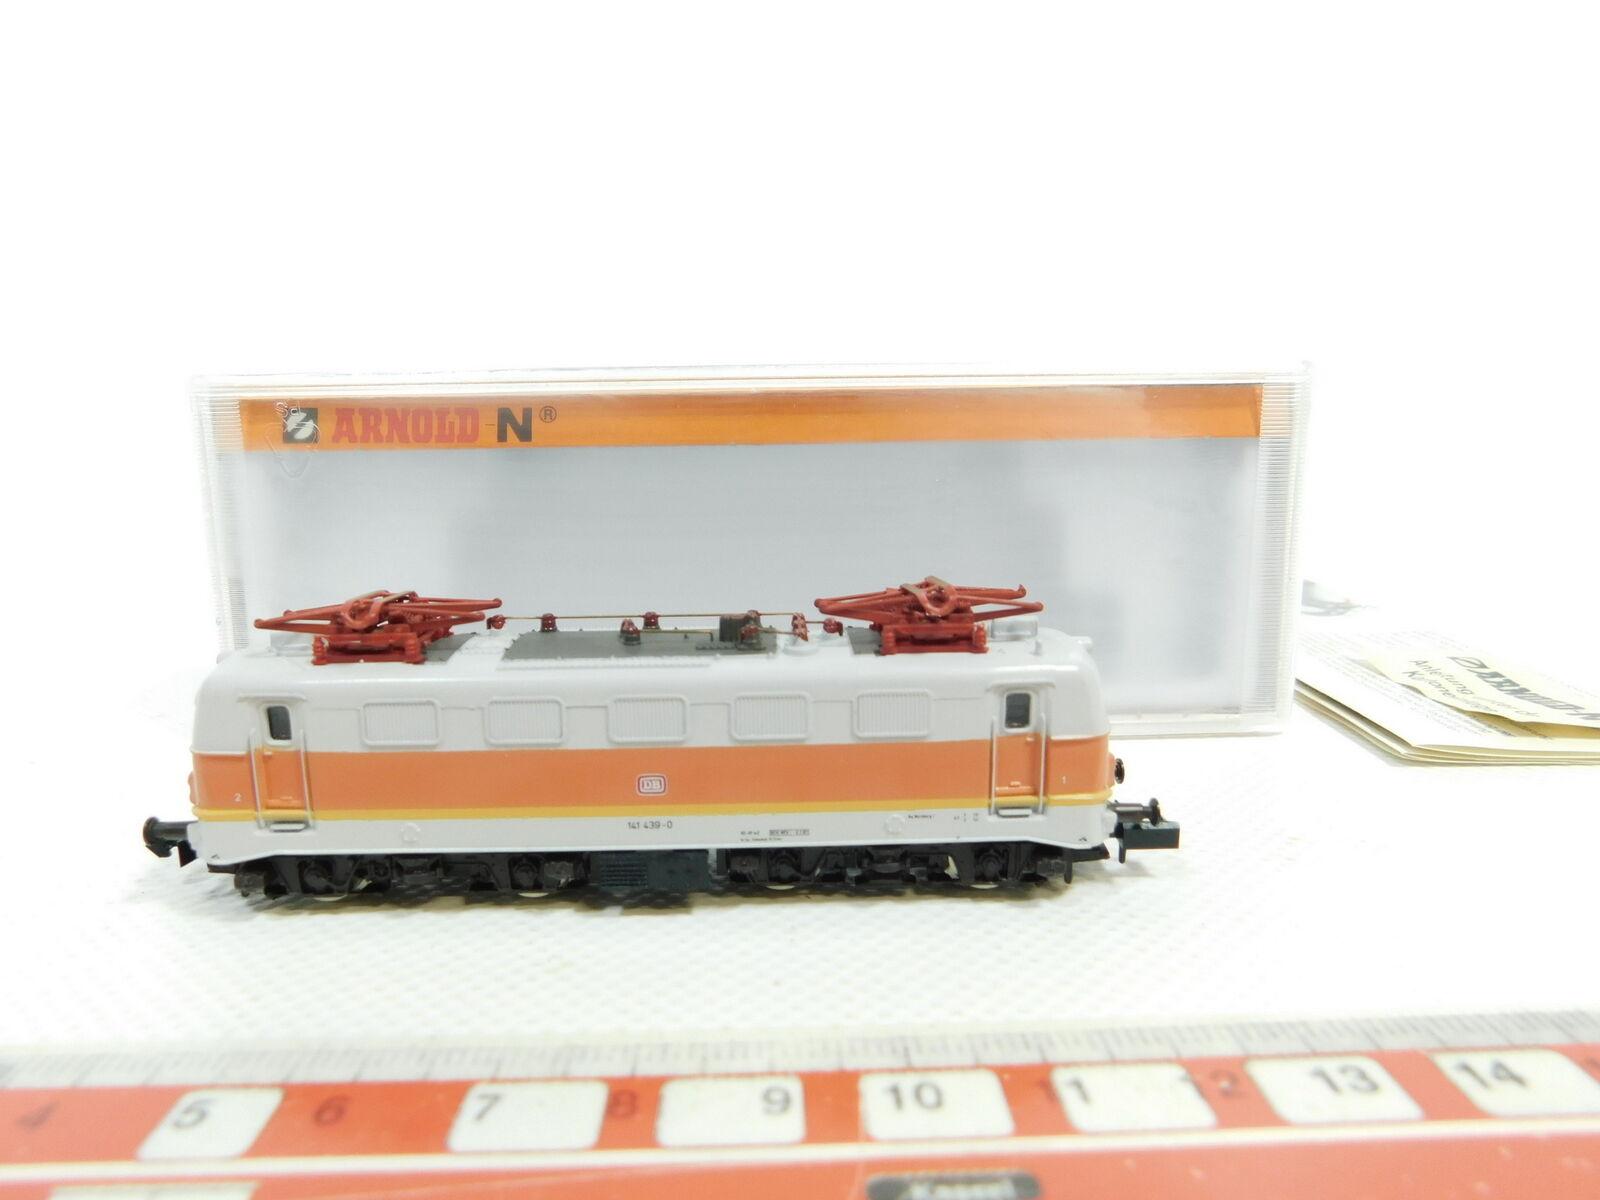 Bg926-0, 5  Arnold Spur N/DC 2324 E-Locomotiva 141 439-0 DB, Neuw + OVP